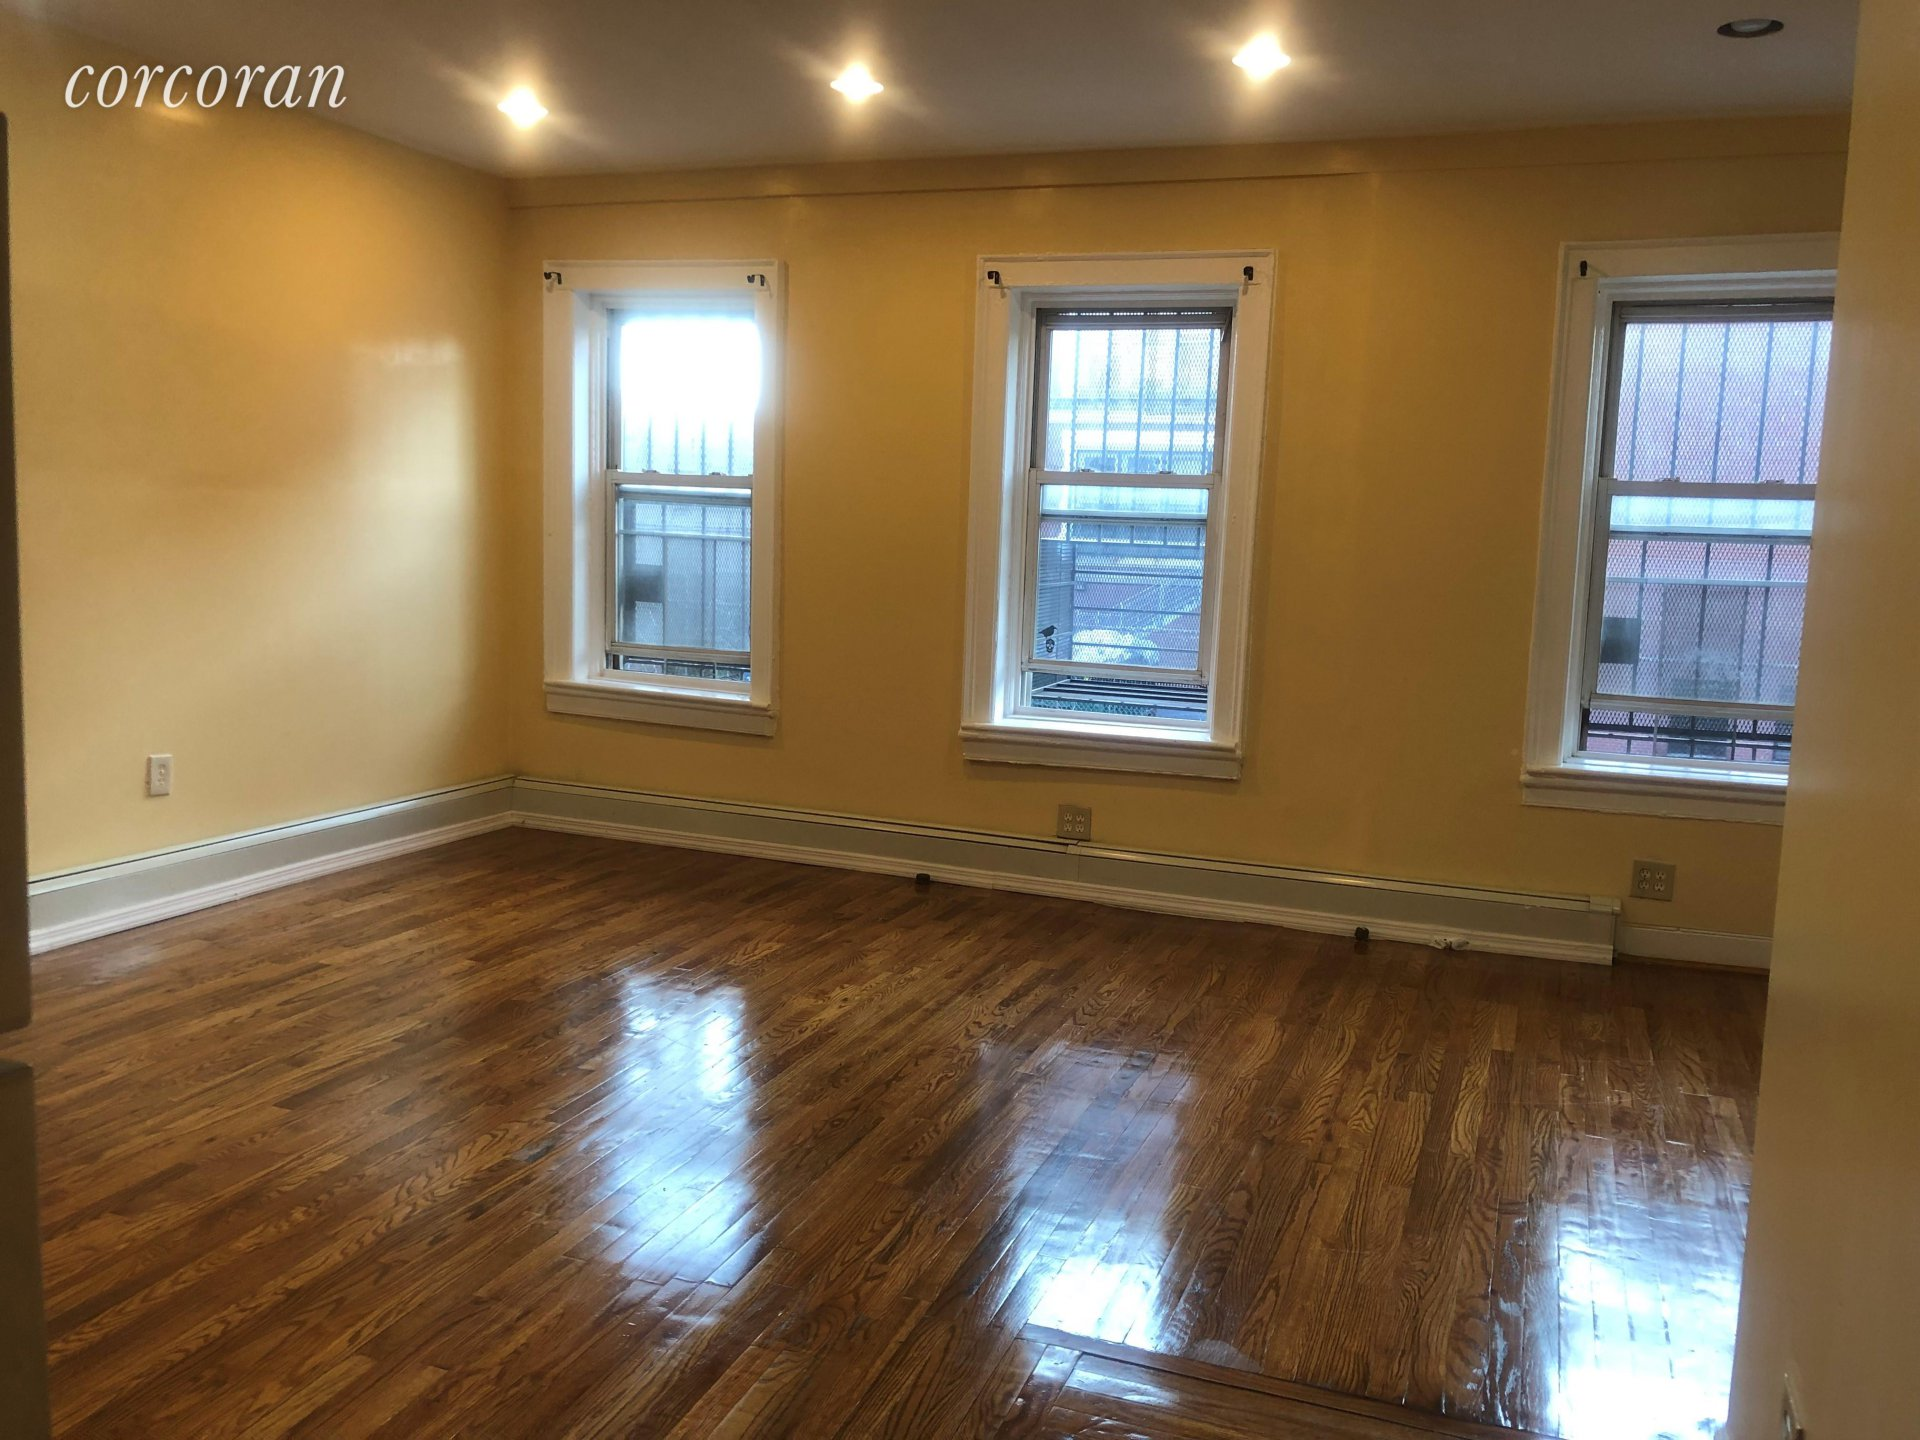 Ad Rental Apartment Brooklyn (11216) ref:5825652